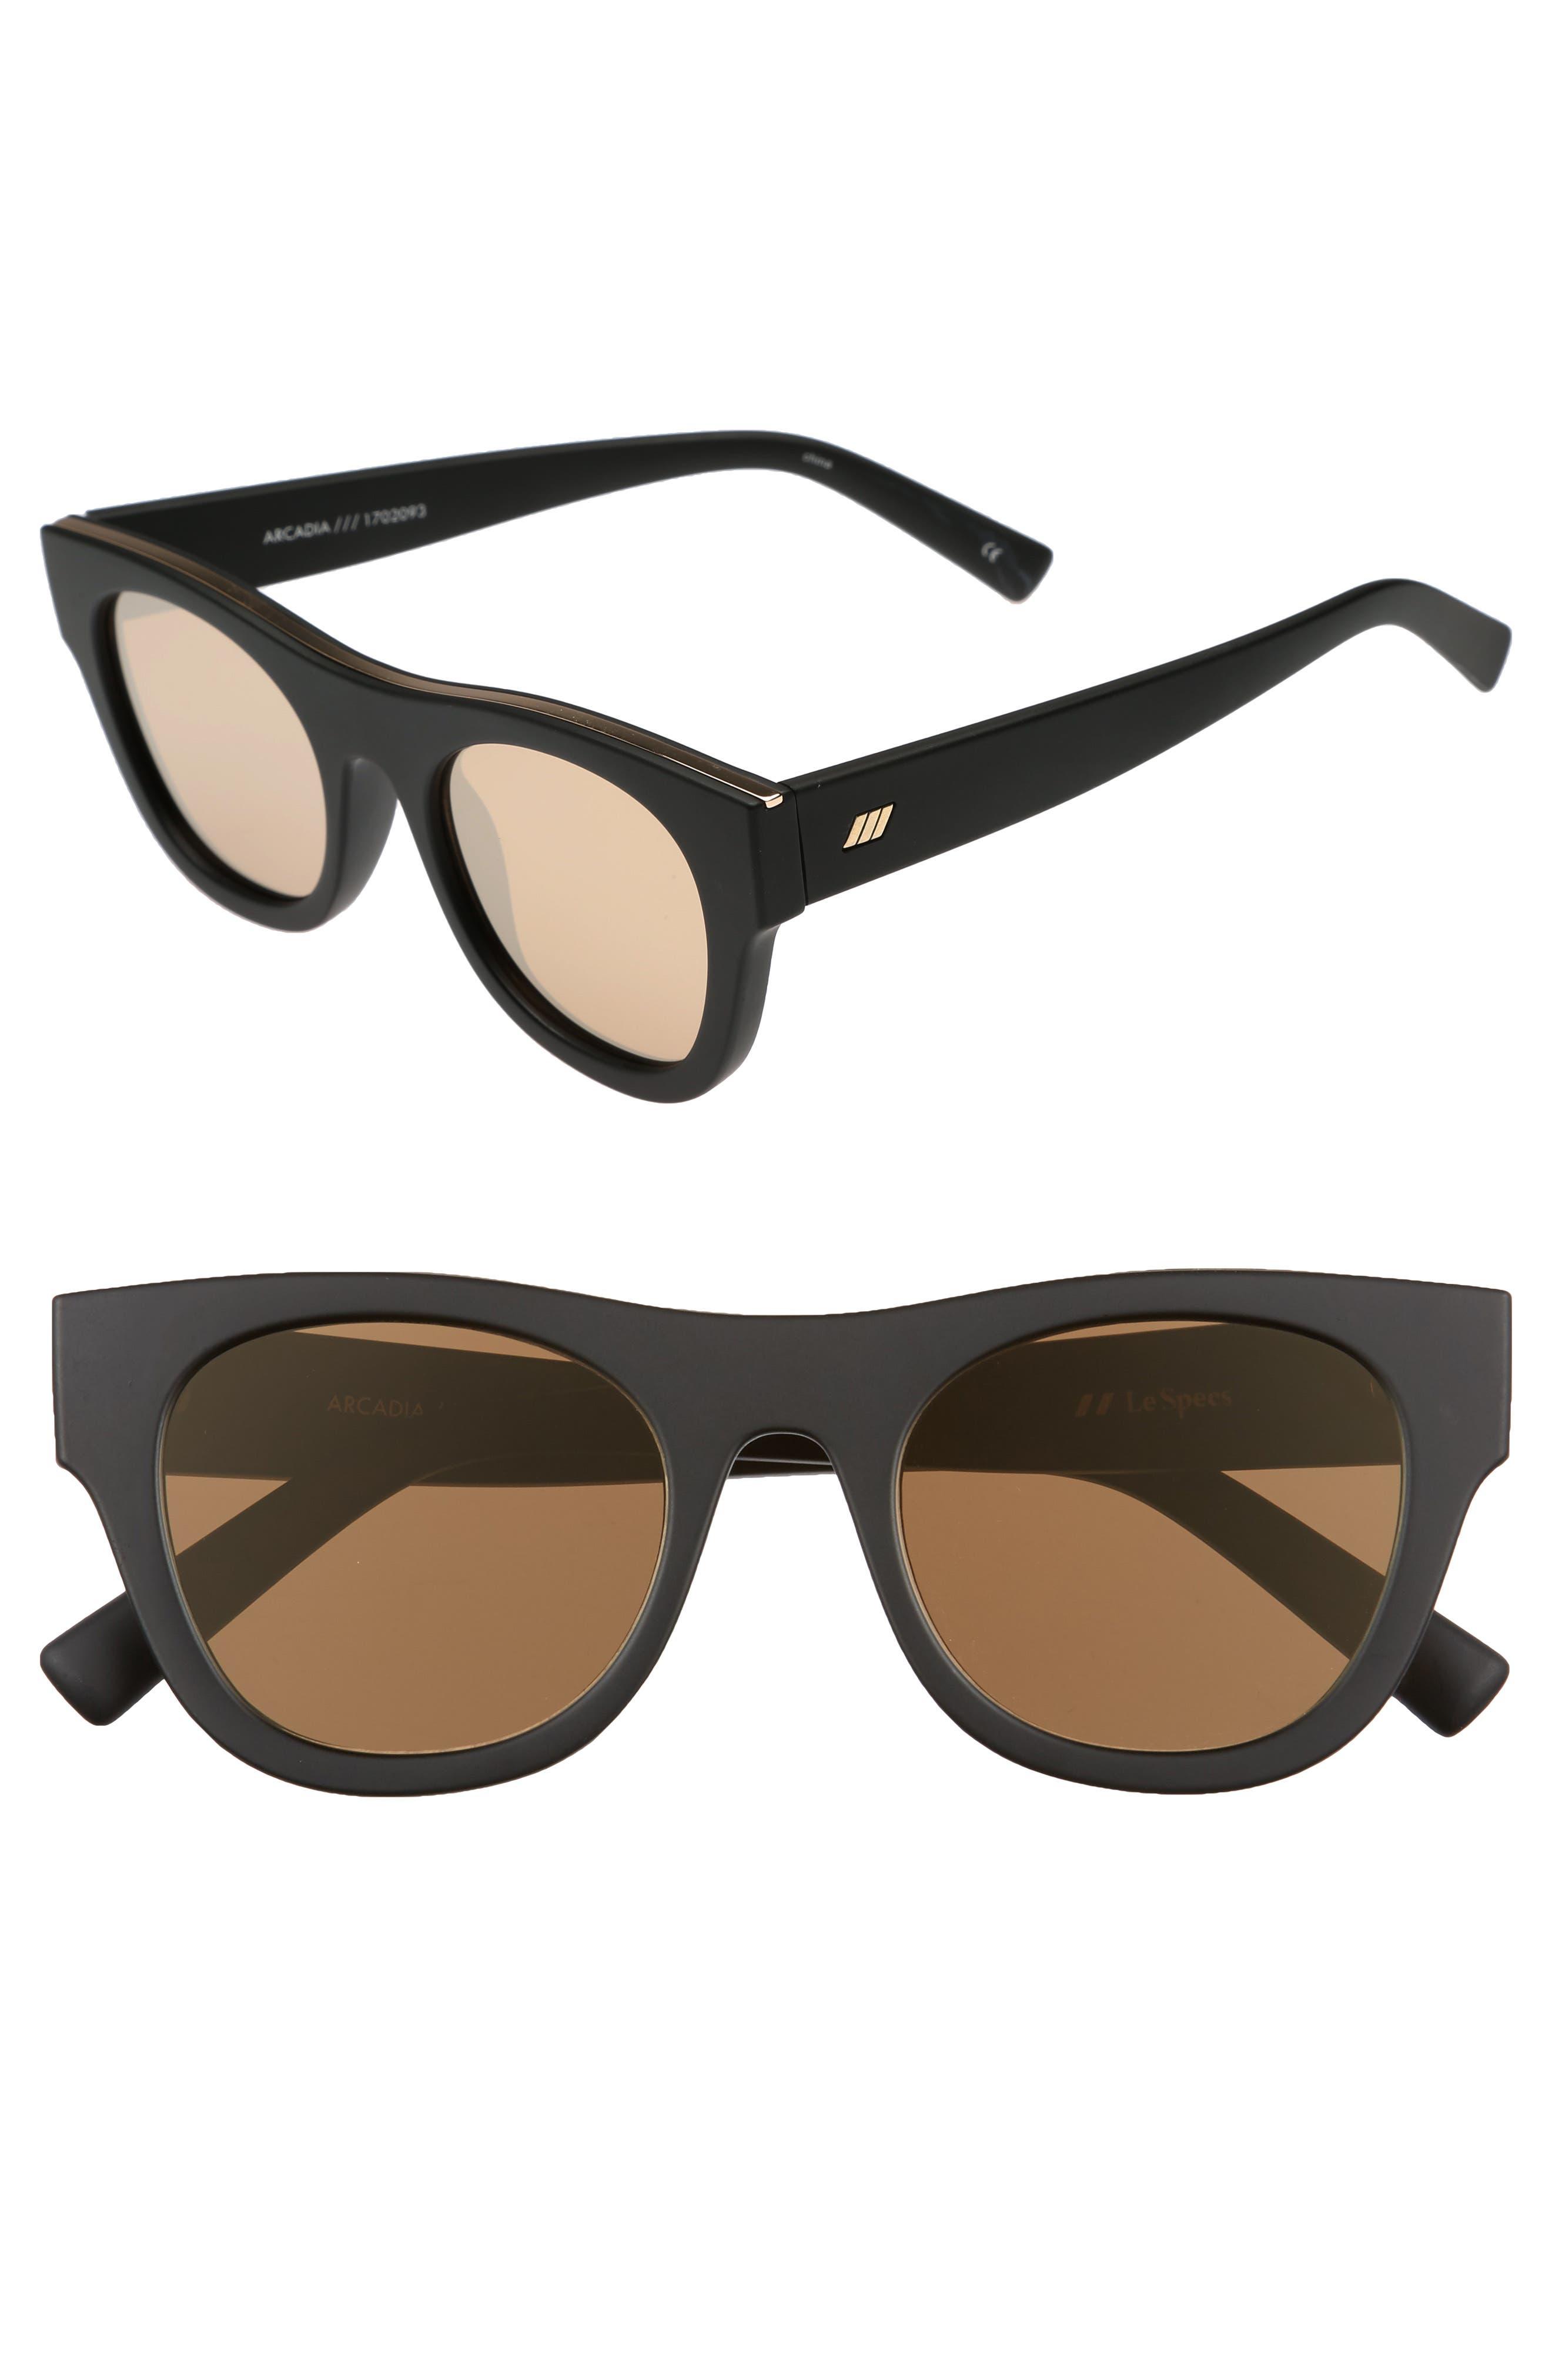 Main Image - Le Specs Arcadia 49mm Sunglasses